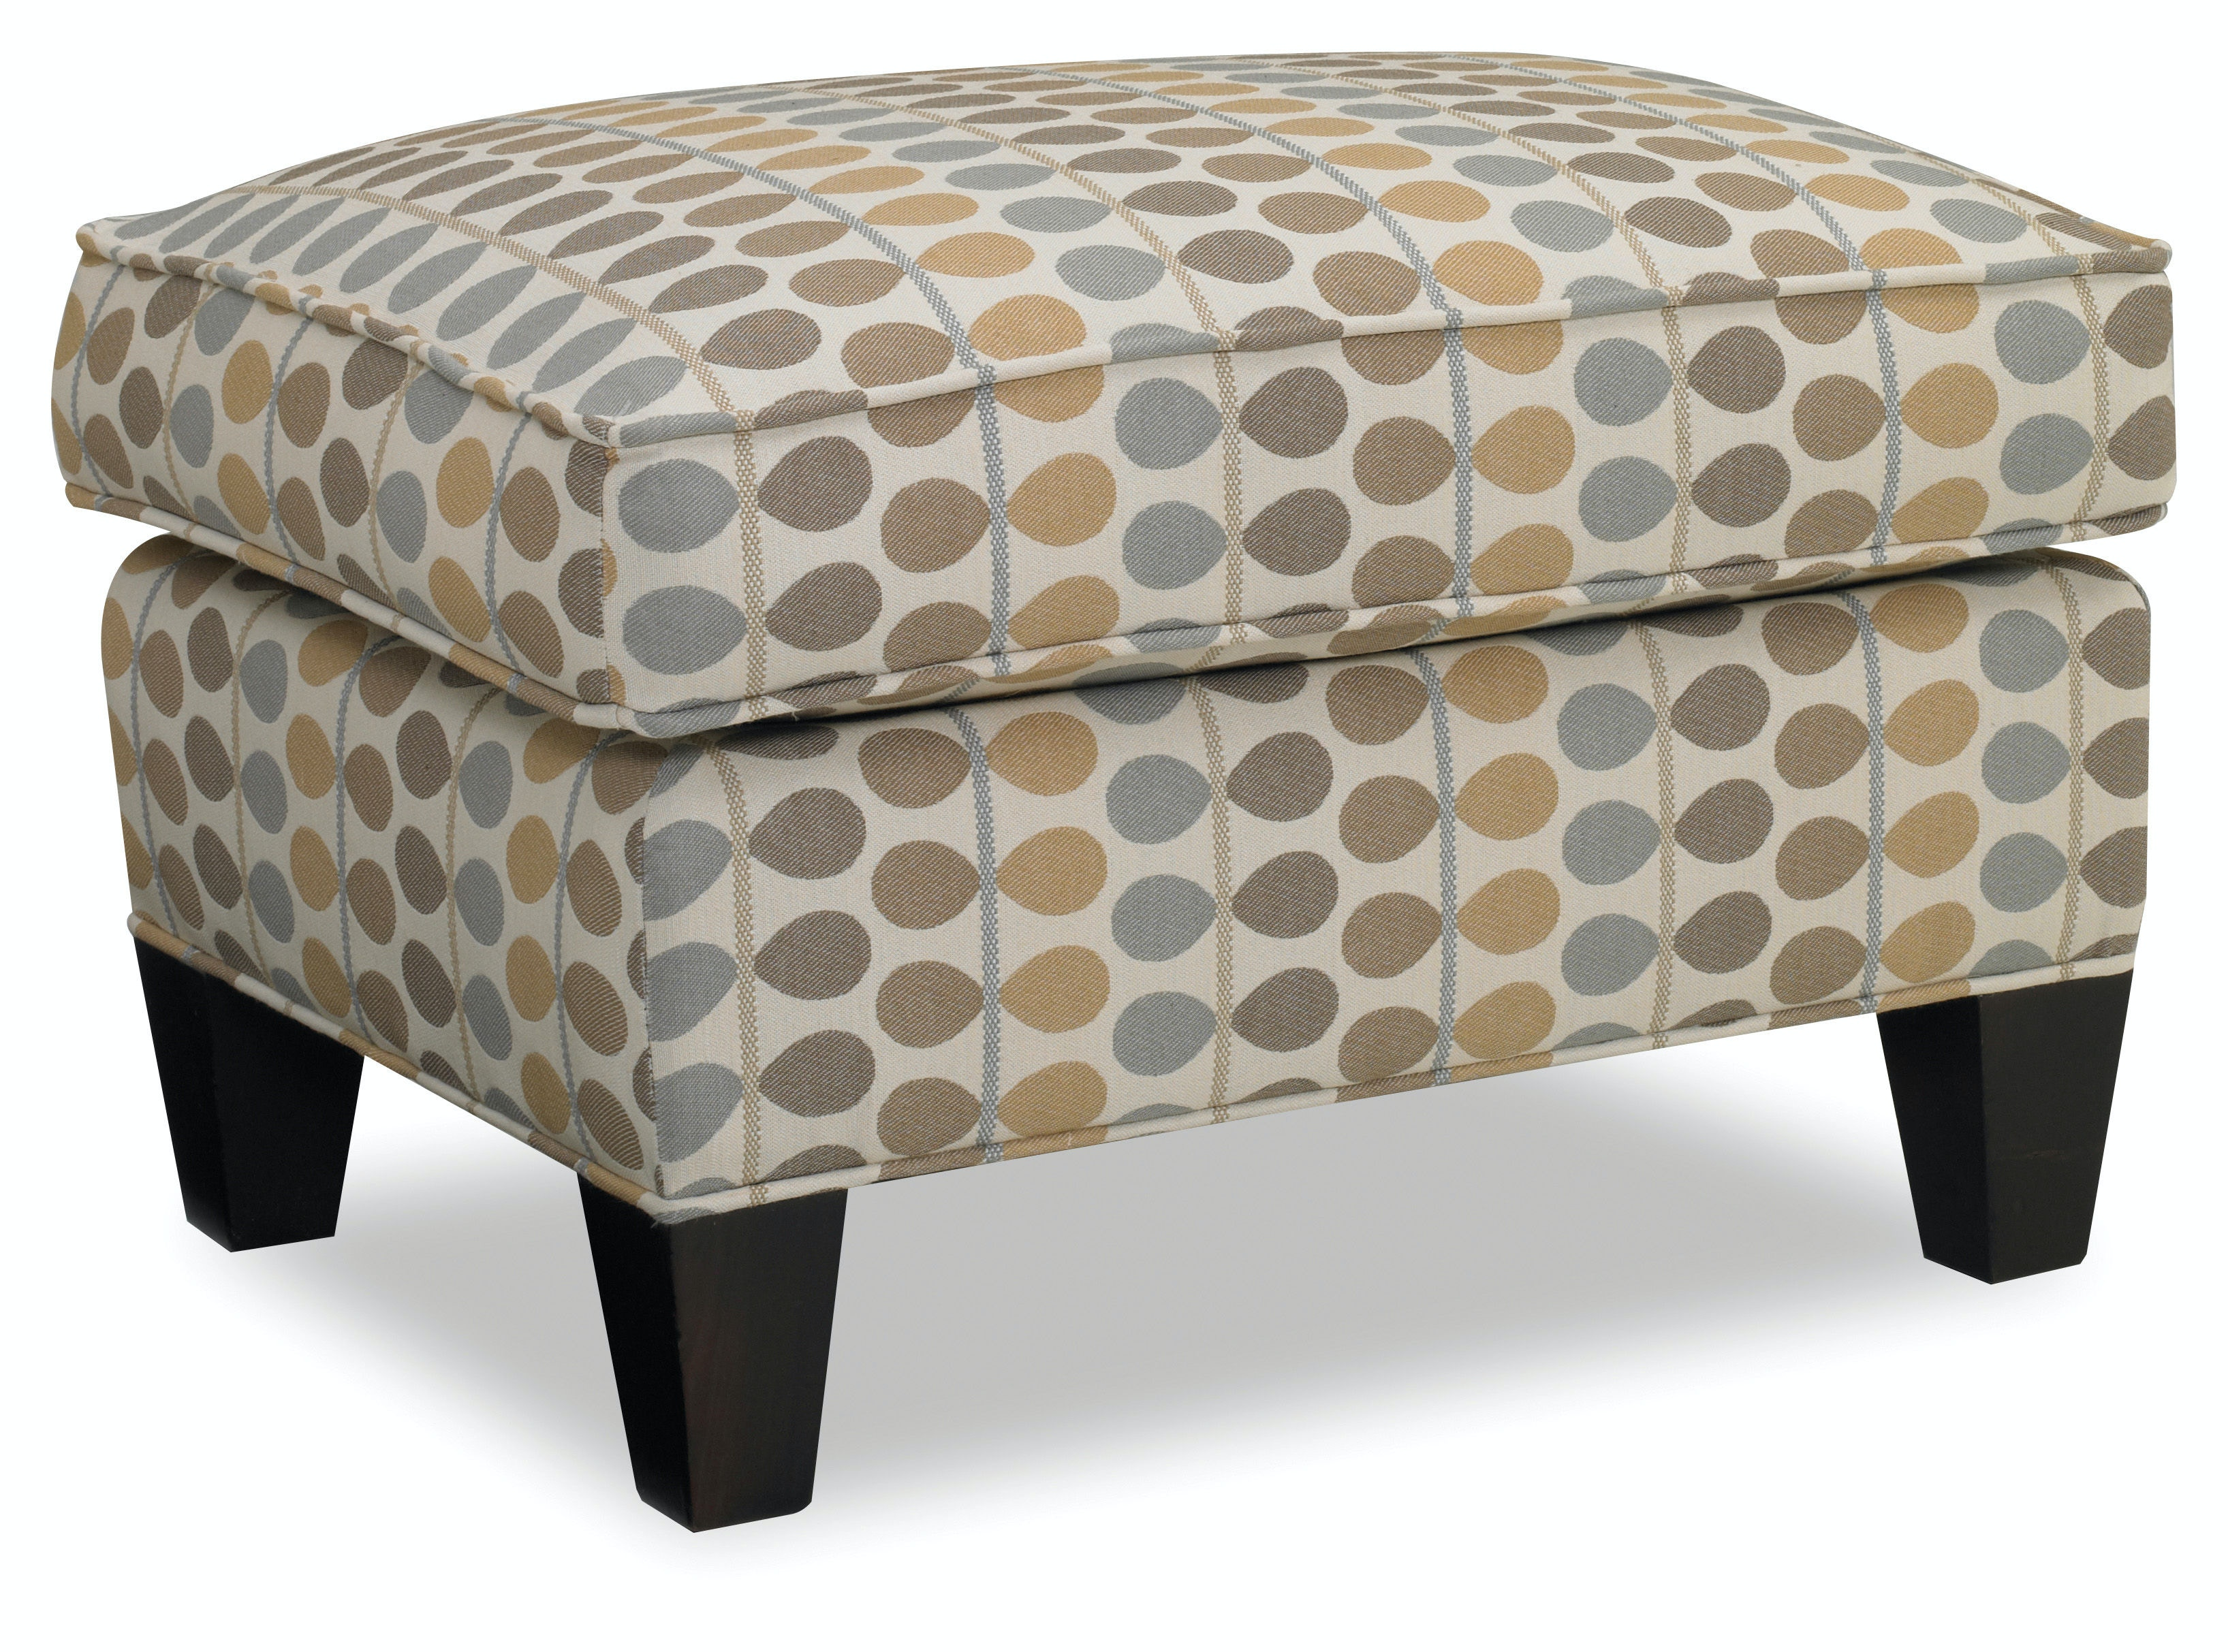 urban sofa gallery lucite acrylic table sam moore living room ottoman 1061 hamilton leather at